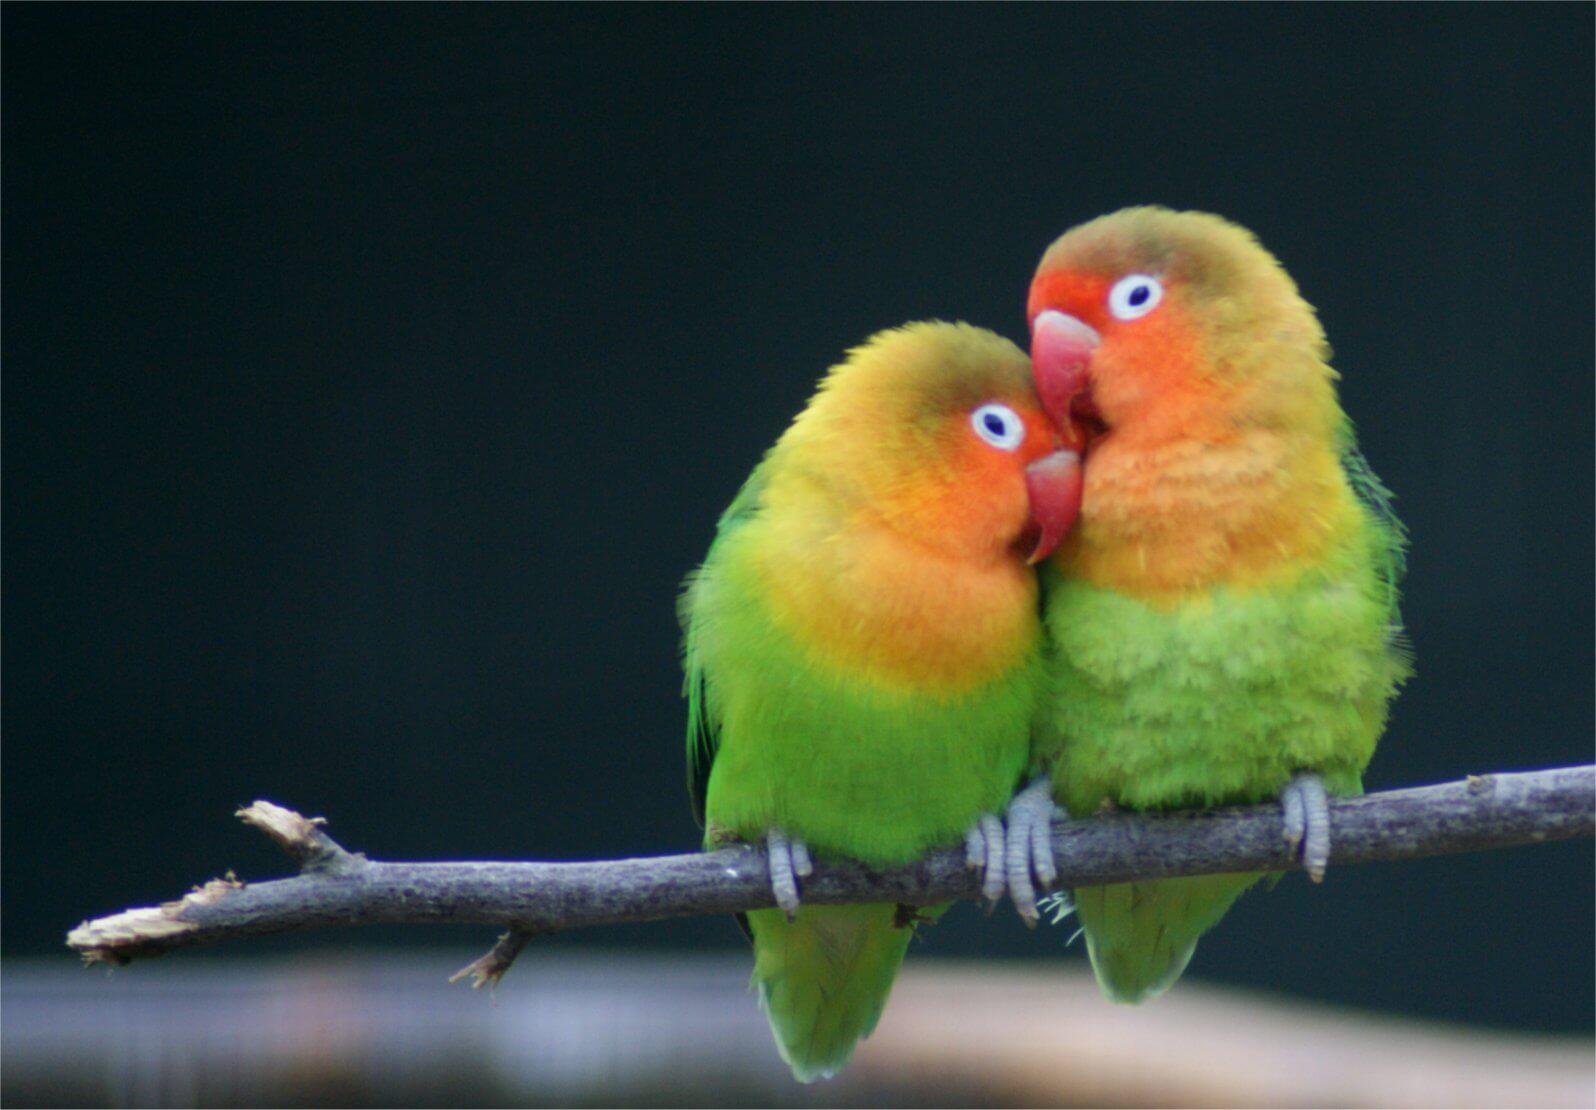 bagaimana cara memelihara lovebird